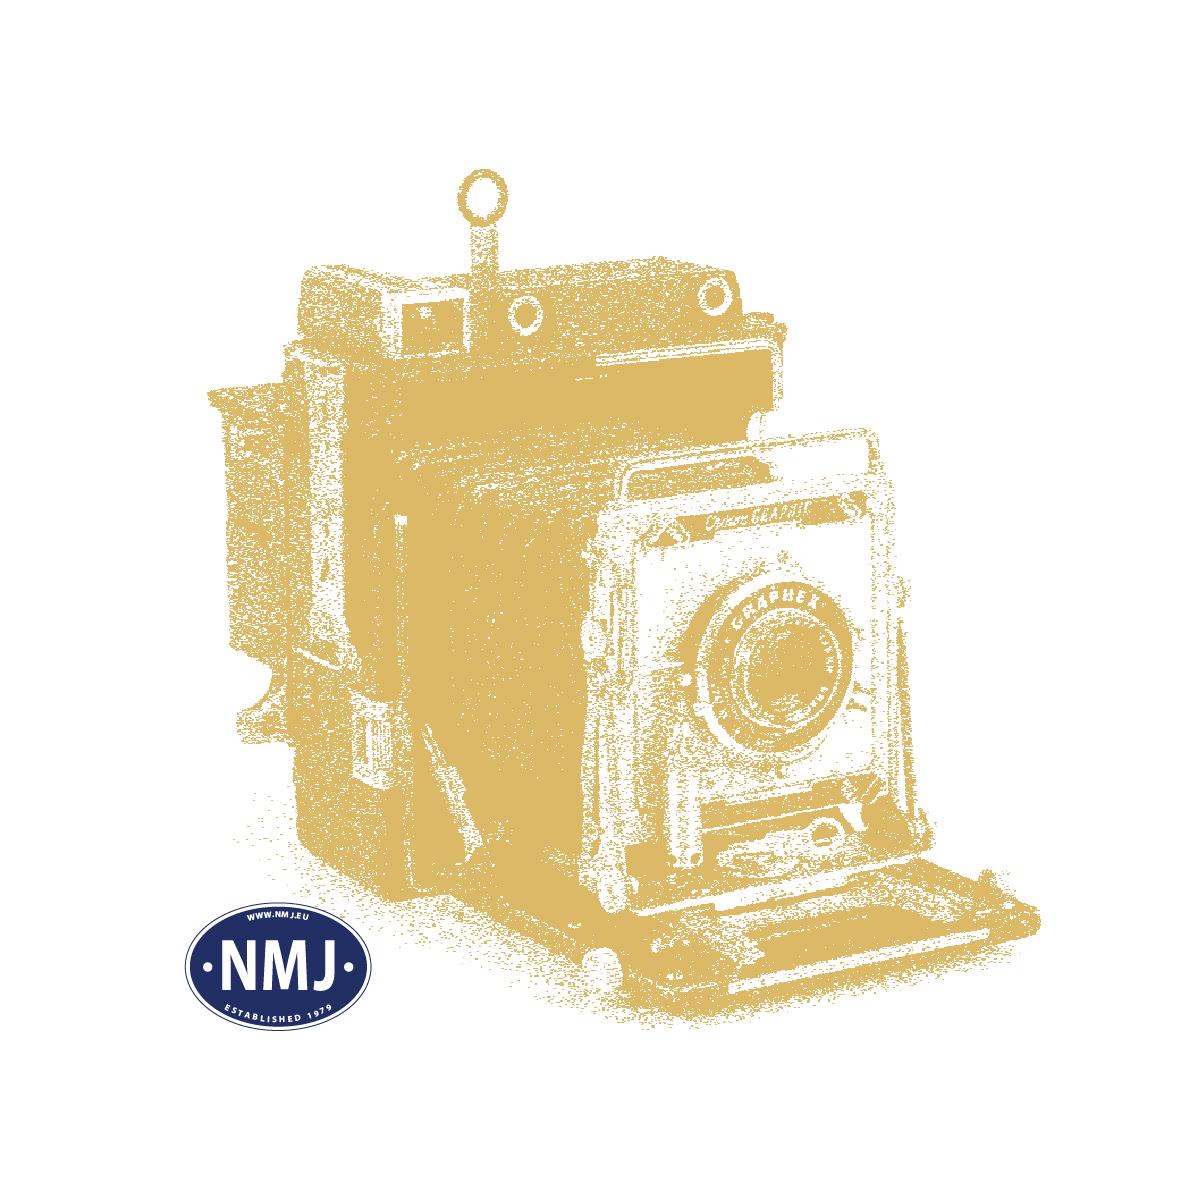 FAL180201 - Dobbel Gatelampe